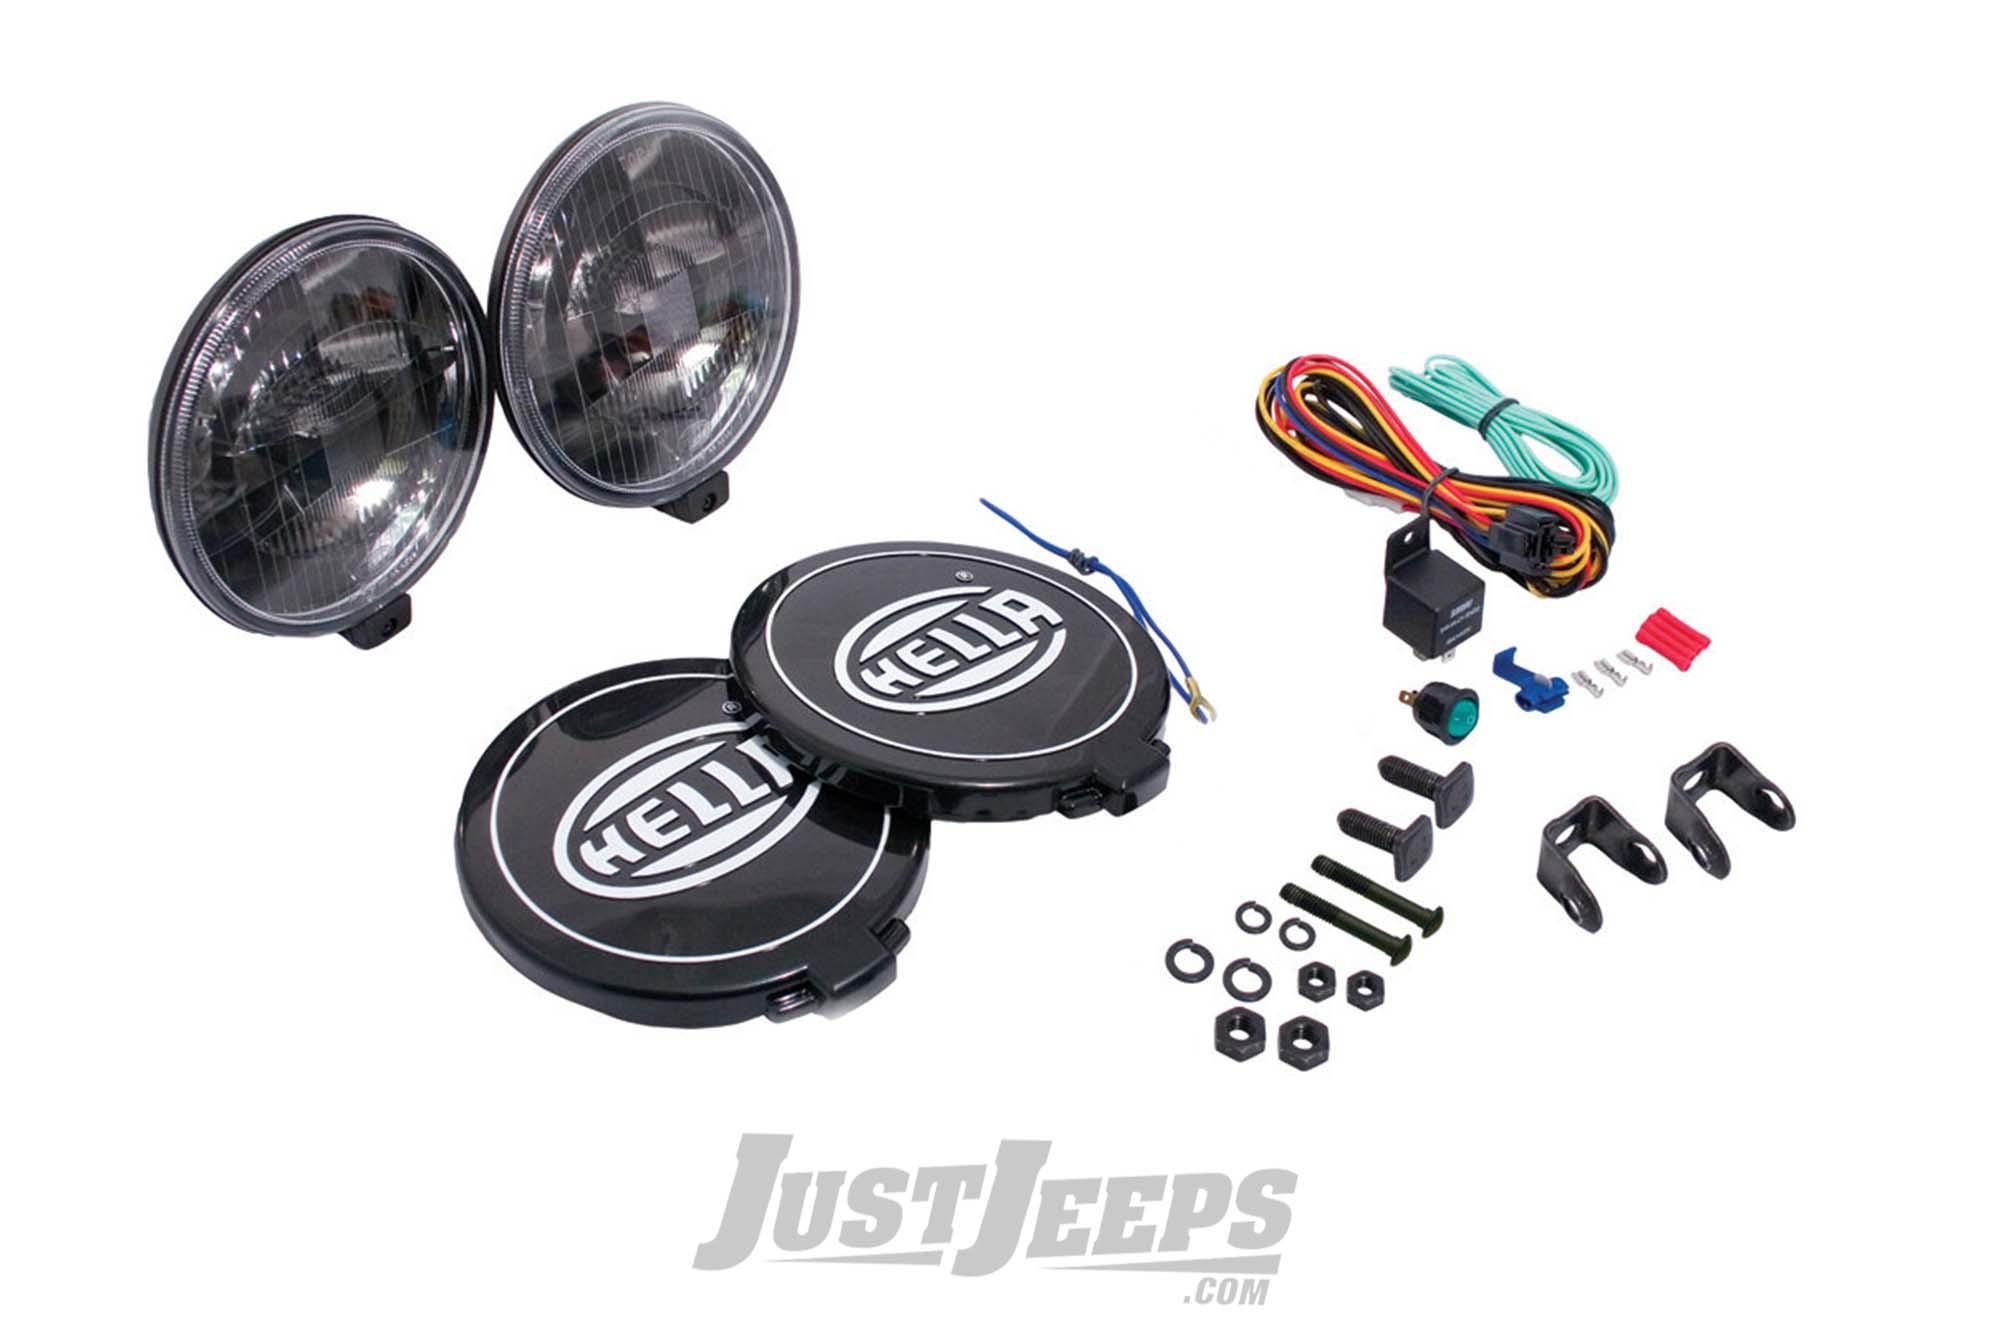 Just Jeeps Hella 500 Black Magic Driving Lamp Kit